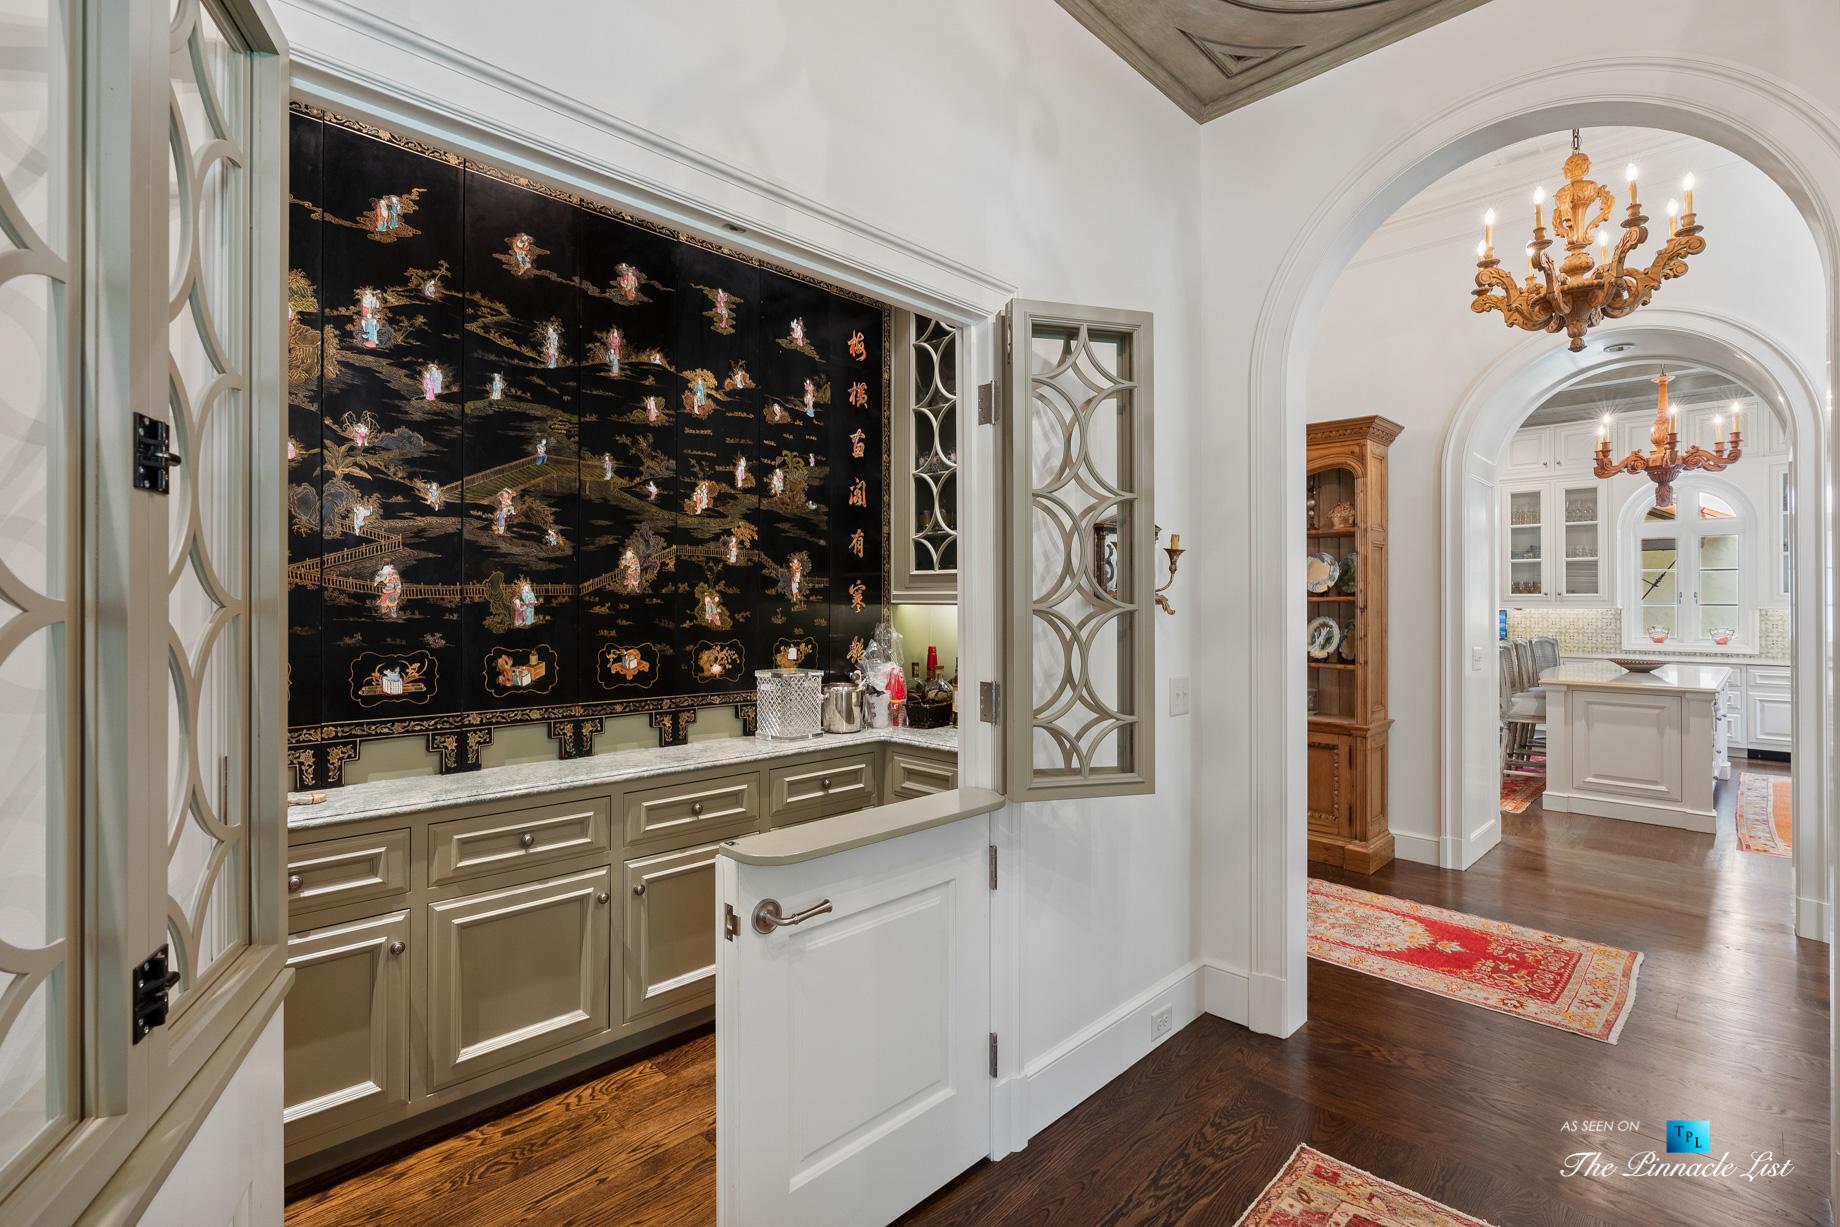 439 Blackland Rd NW, Atlanta, GA, USA – Formal Butlers Pantry Station – Luxury Real Estate – Tuxedo Park Mediterranean Mansion Home